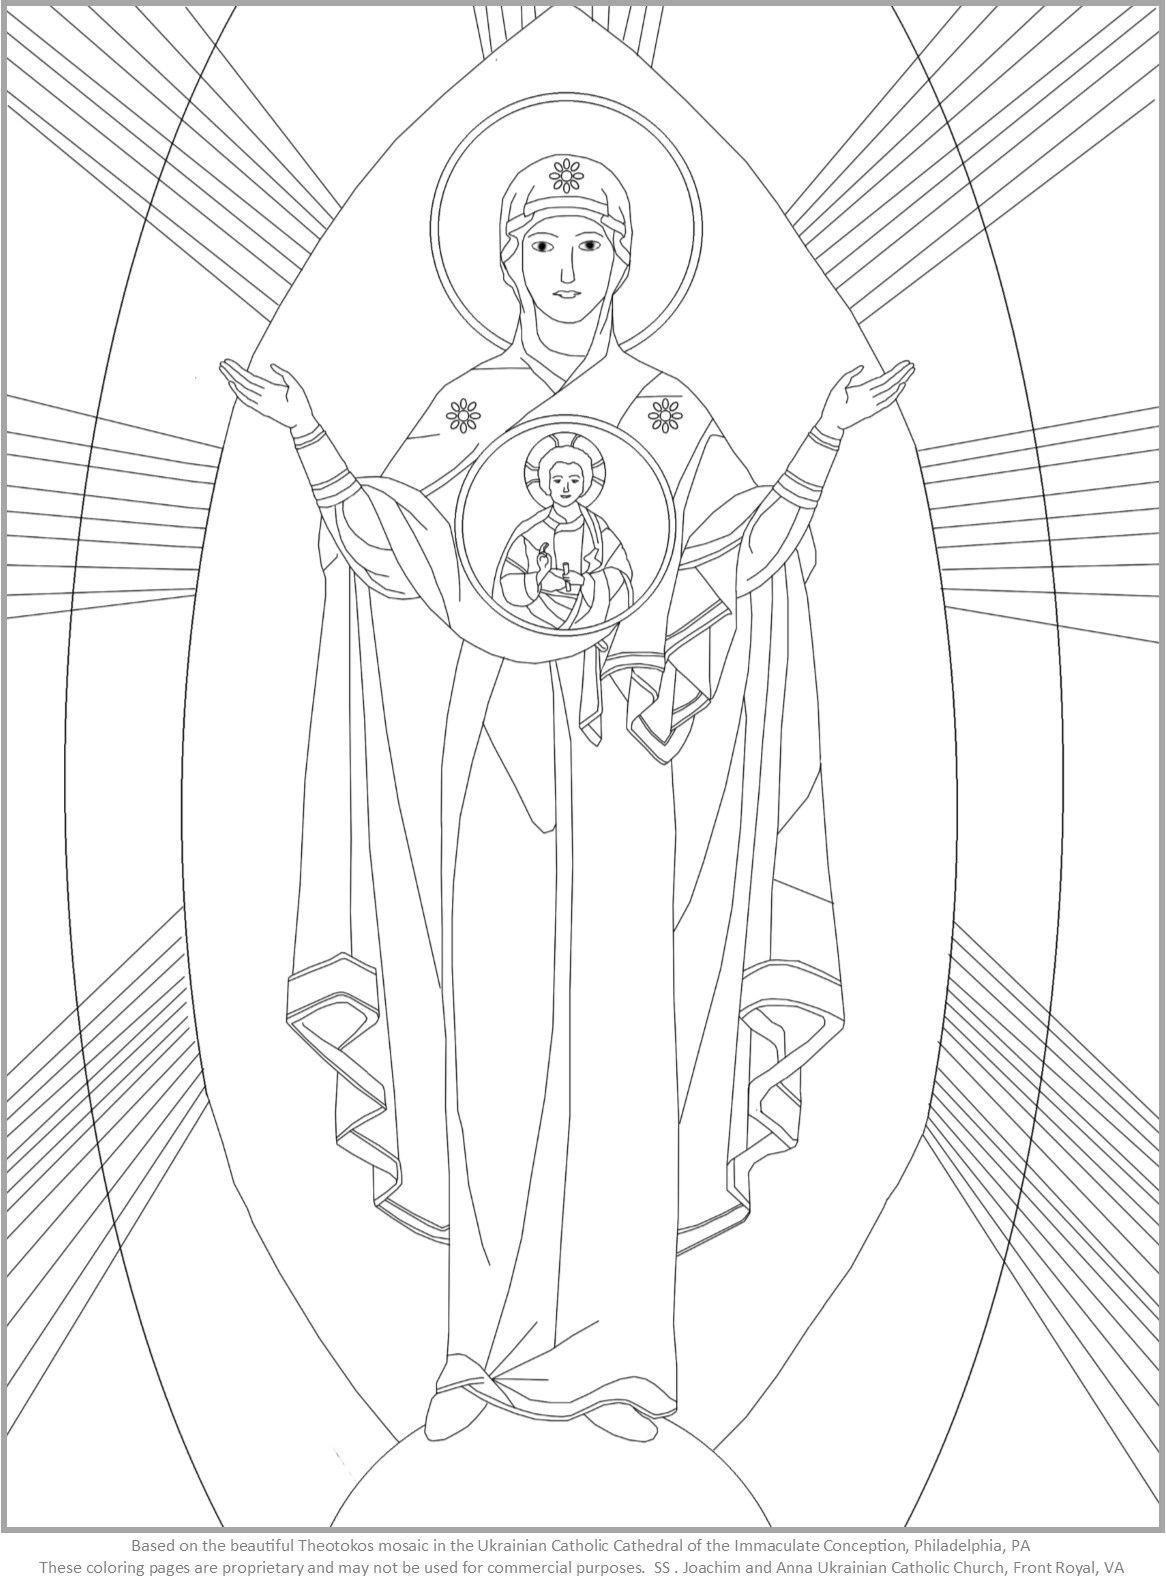 Byzantine Icon of the Theotokos based on the beautiful